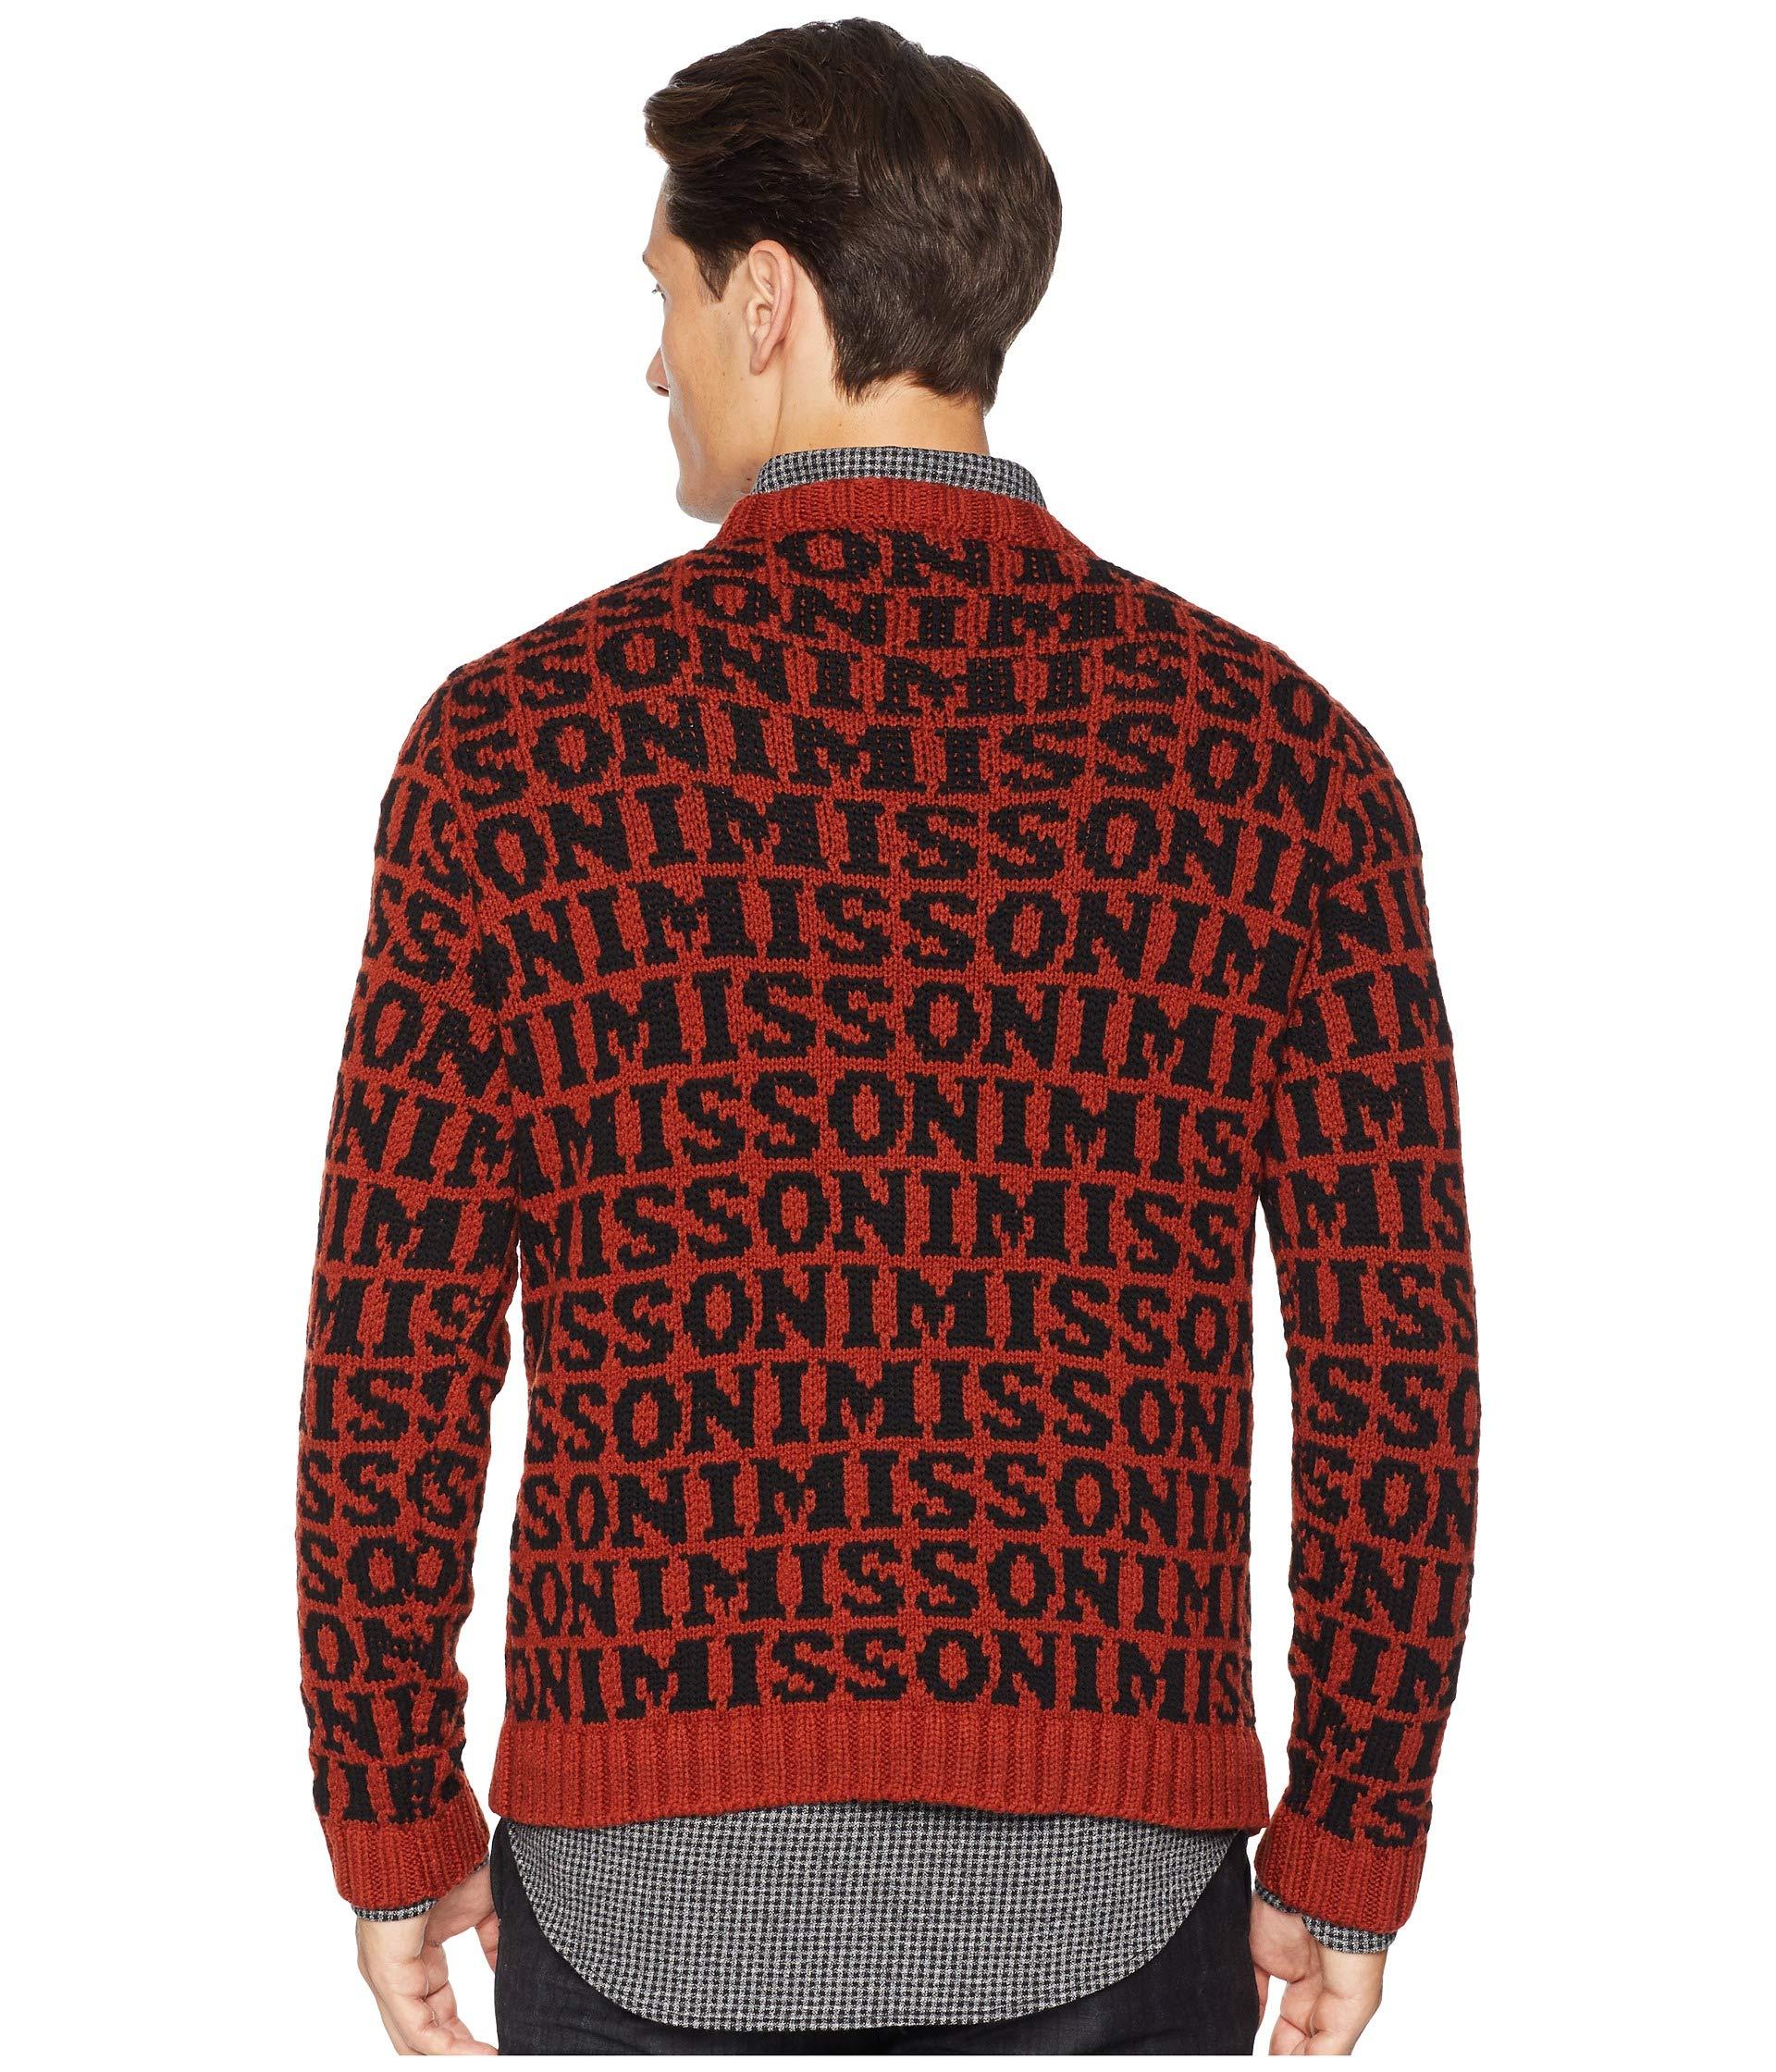 Sweater Logo black Brown Sweater Missoni Missoni Logo n8dwxCqvPw